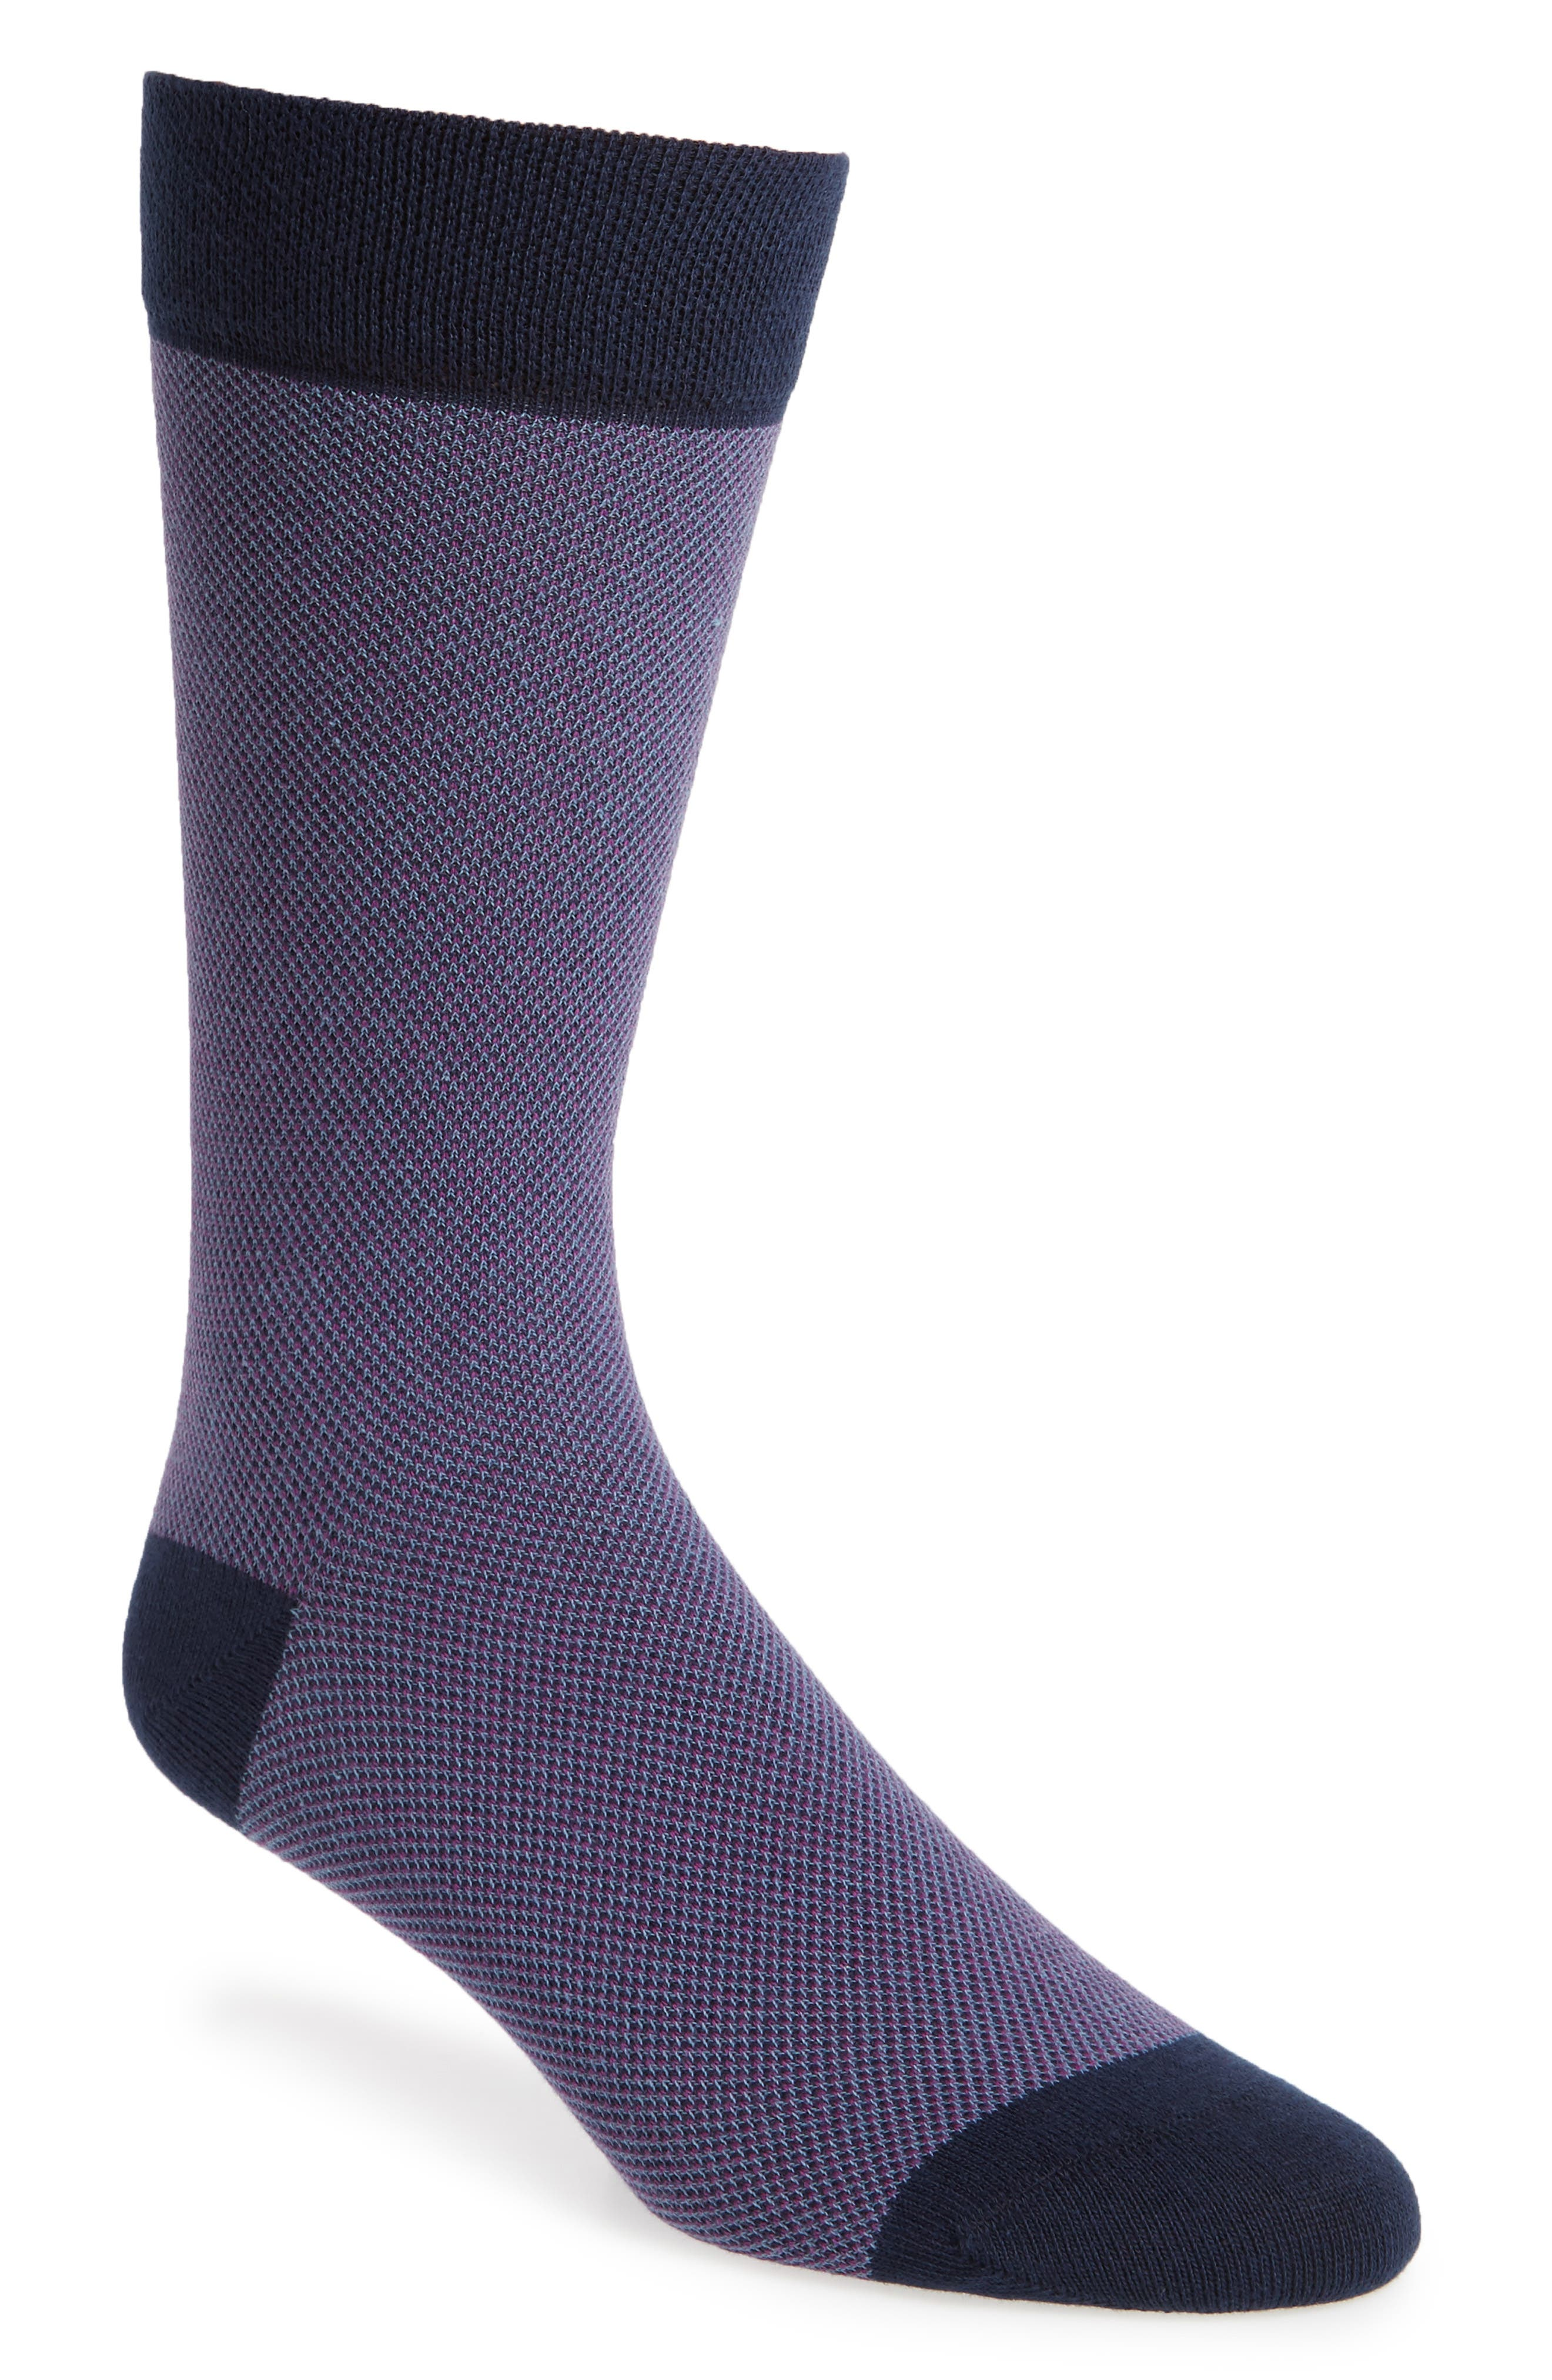 Joaquim Solid Socks,                         Main,                         color, Purple